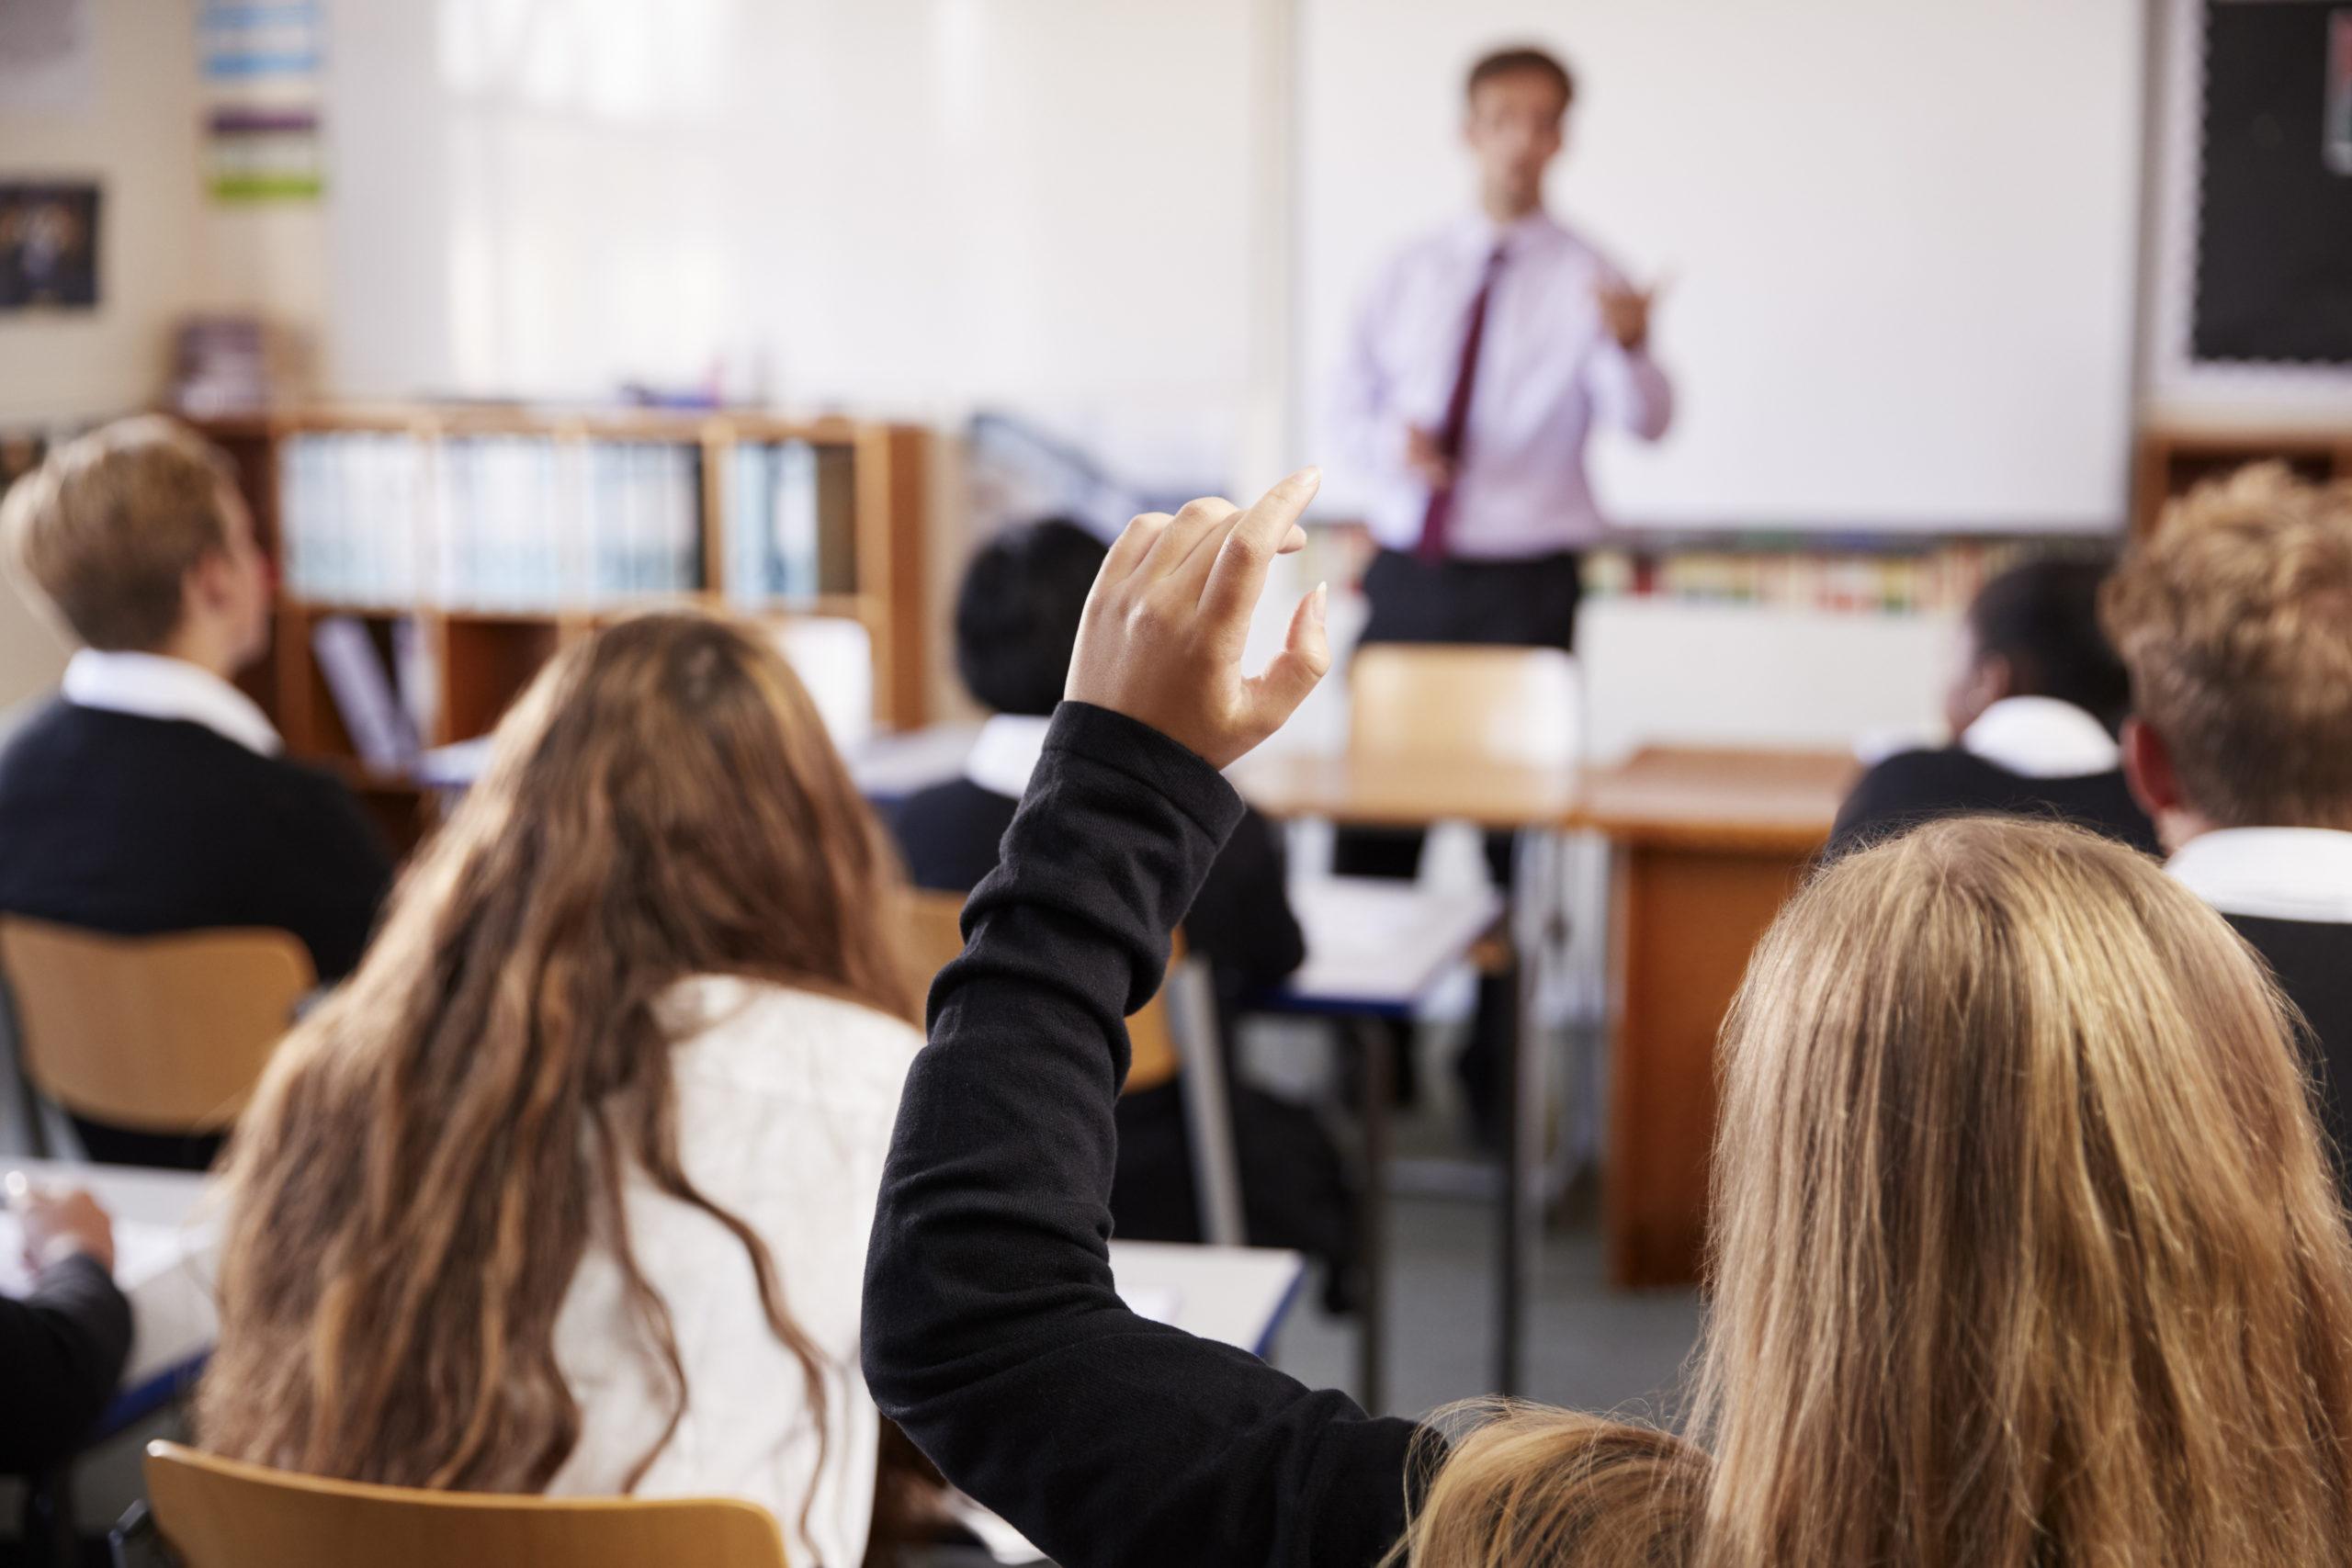 Asbestos Worries in Welsh Schools After Wall Damage